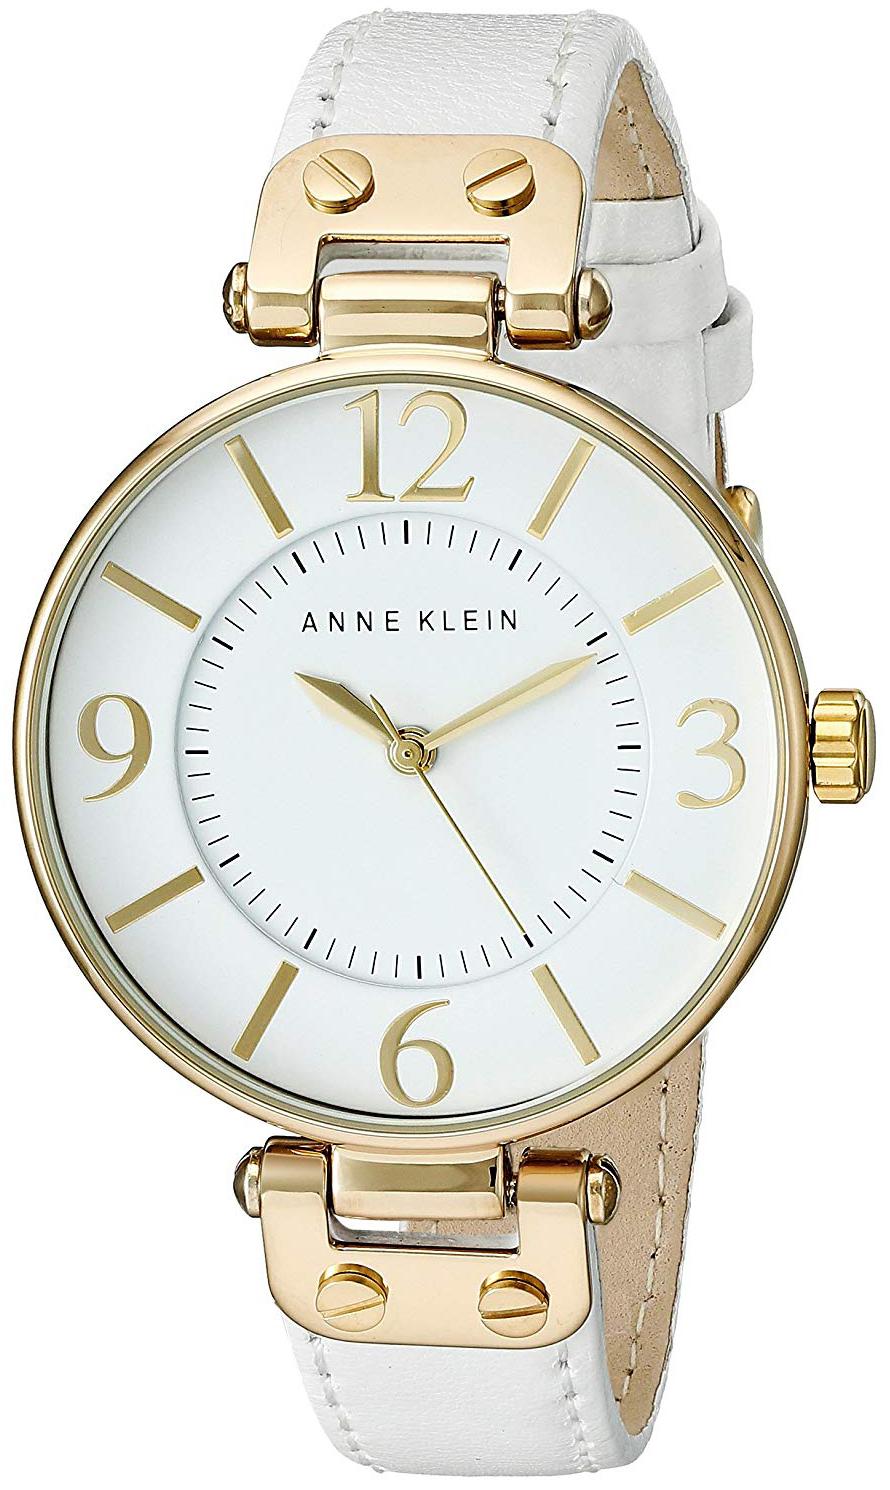 Anne Klein Leather Dameklokke 10/9168WTWT Hvit/Lær Ø34 mm - Anne Klein